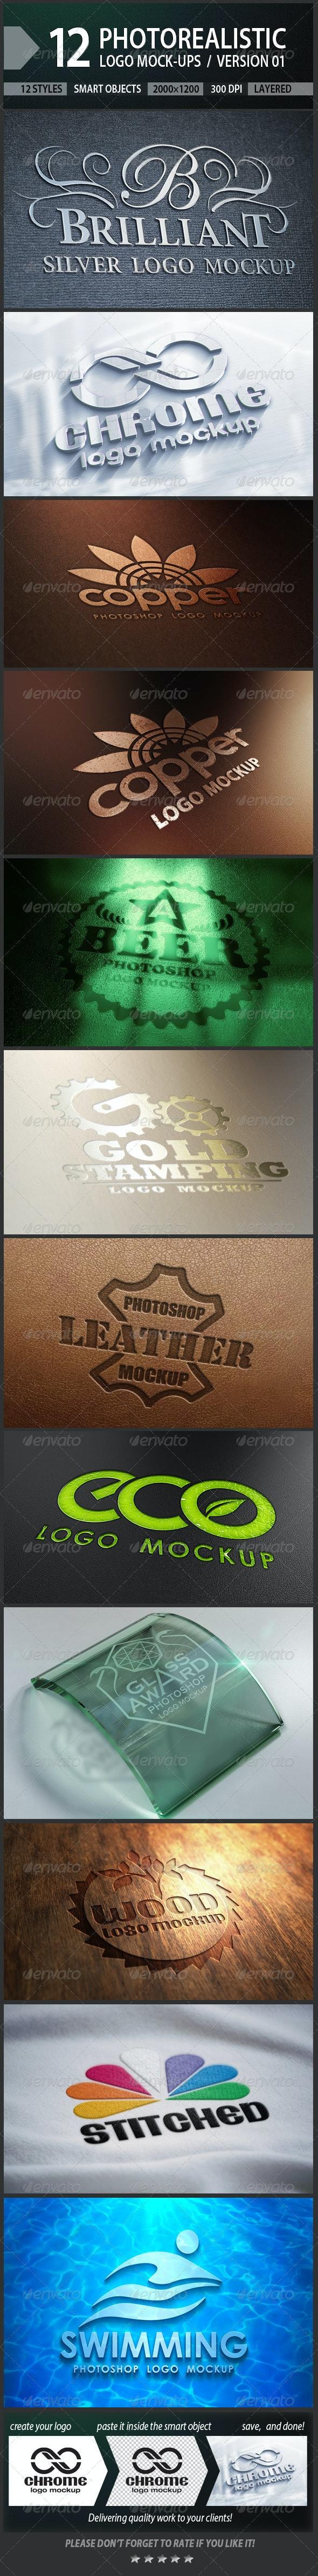 12 Photorealistic Logo Mock-ups / Version 01 - Logo Product Mock-Ups